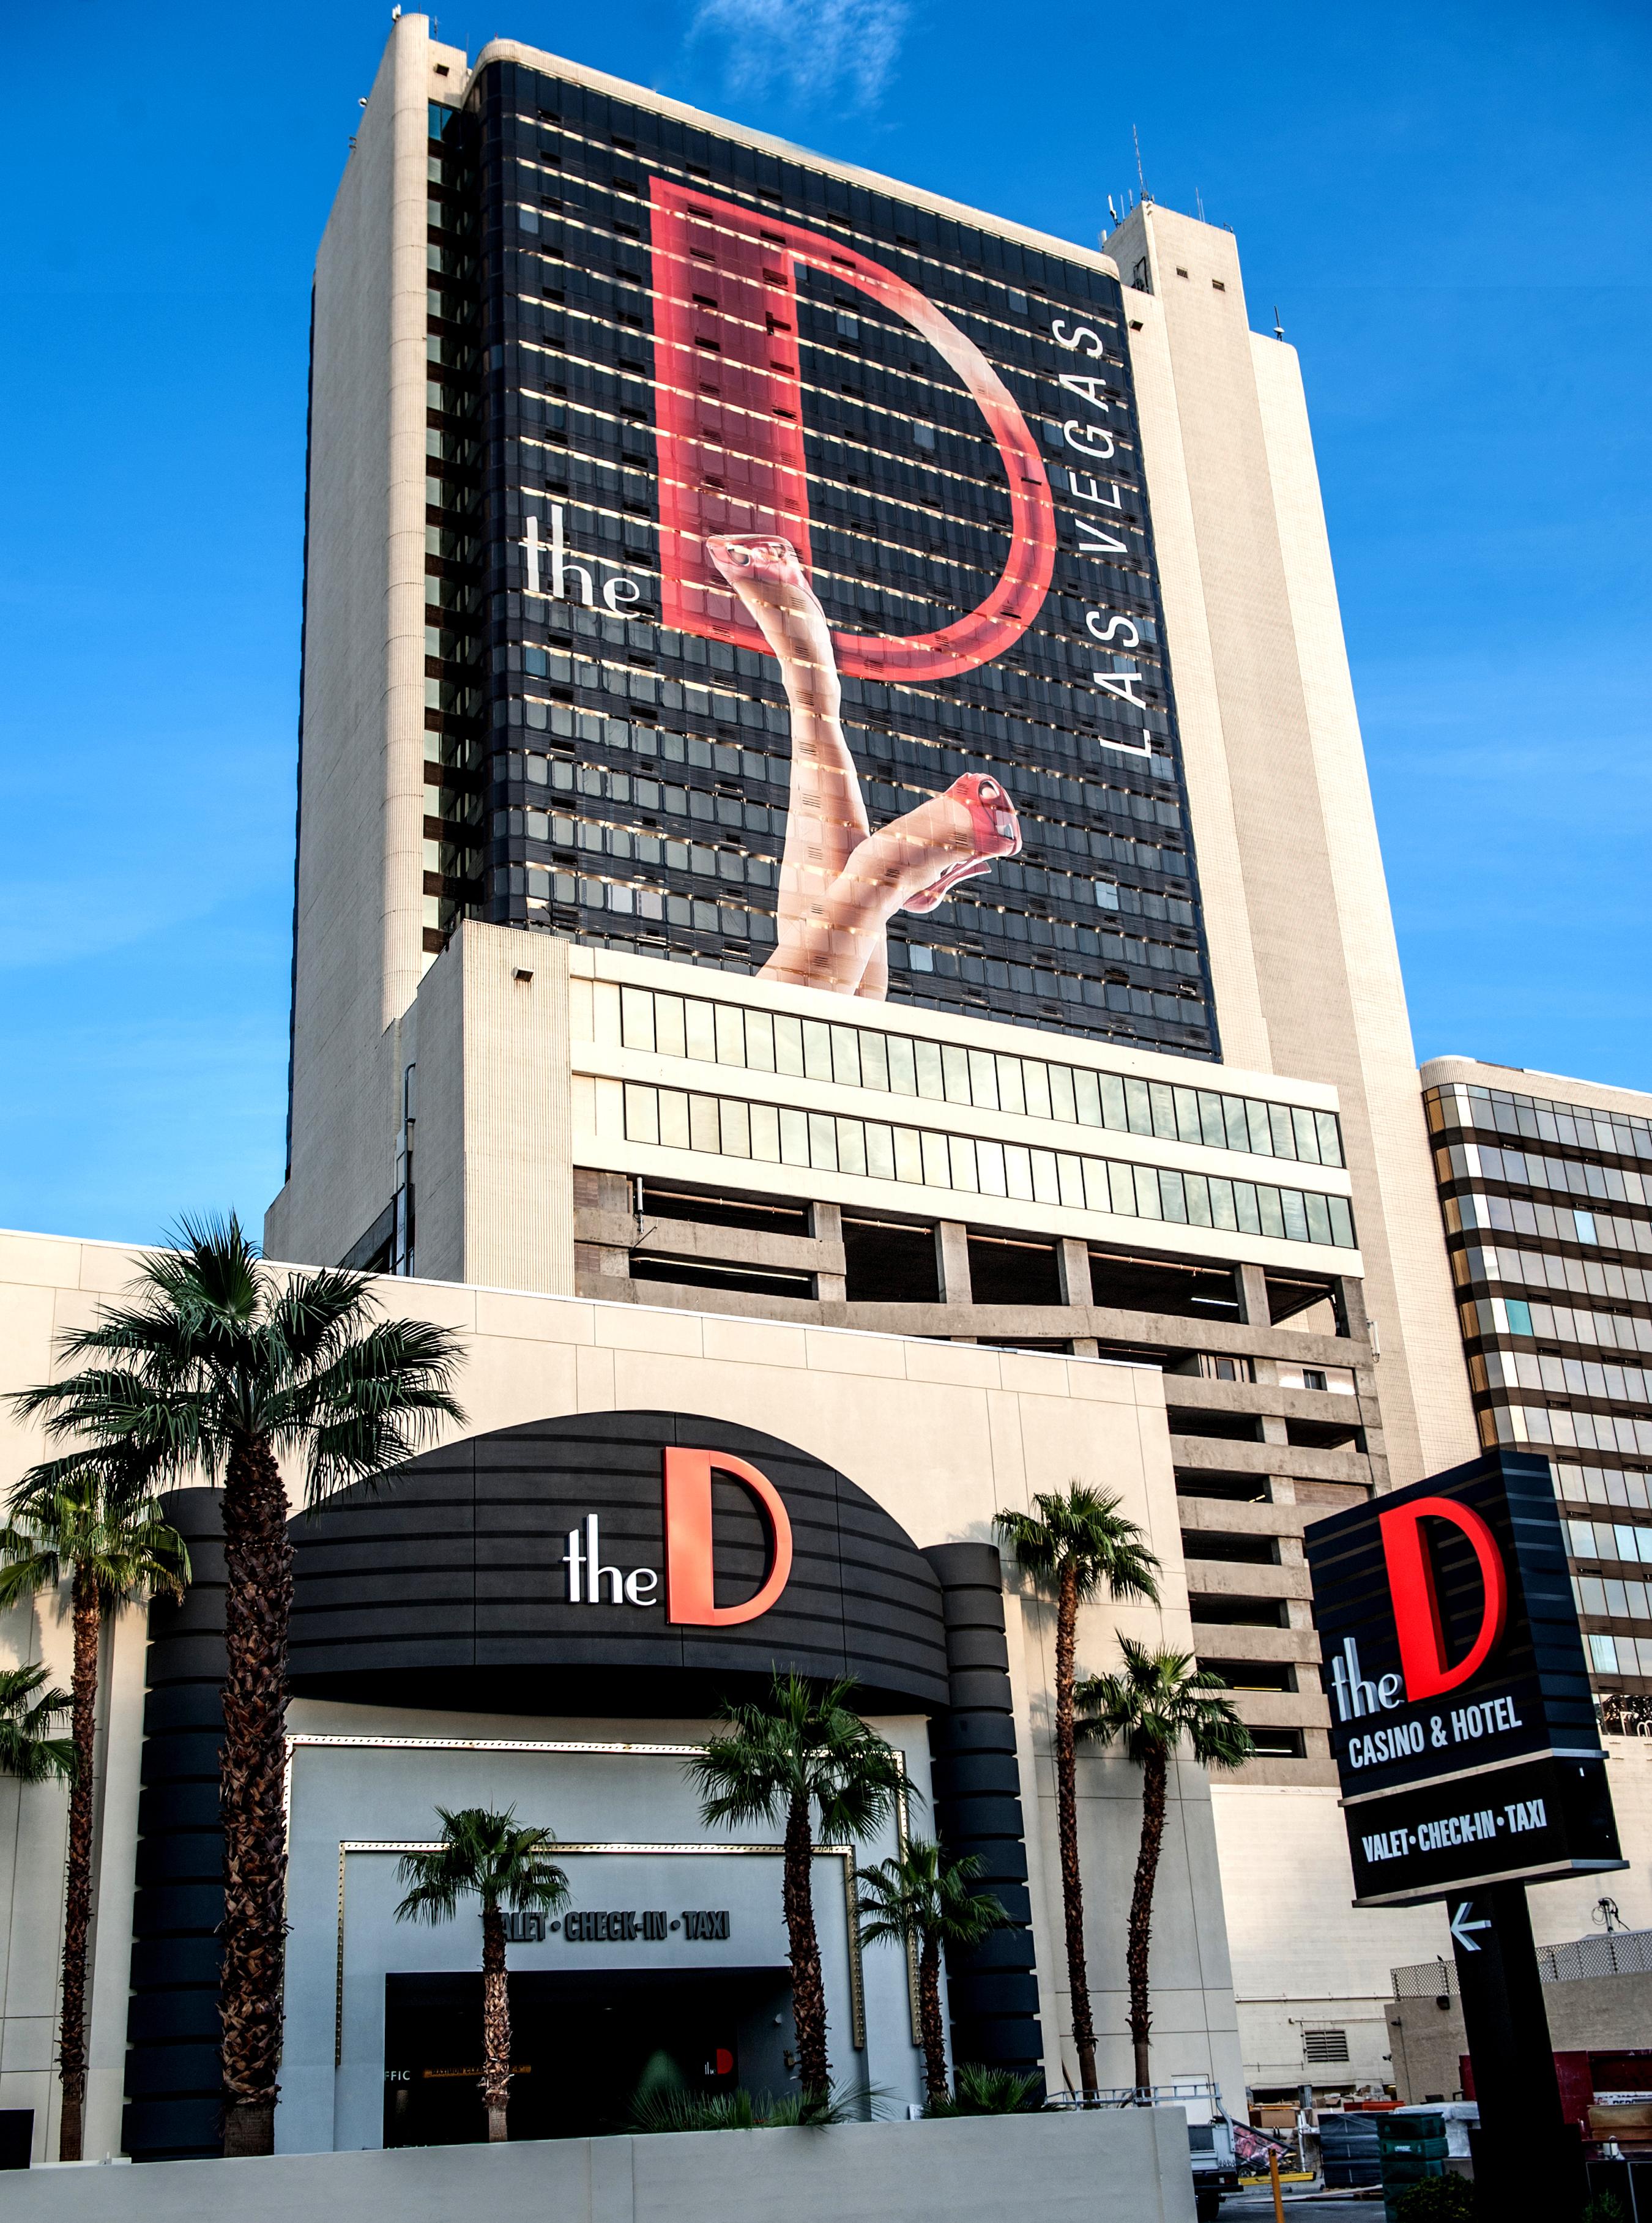 casino las vegas online story of alexander